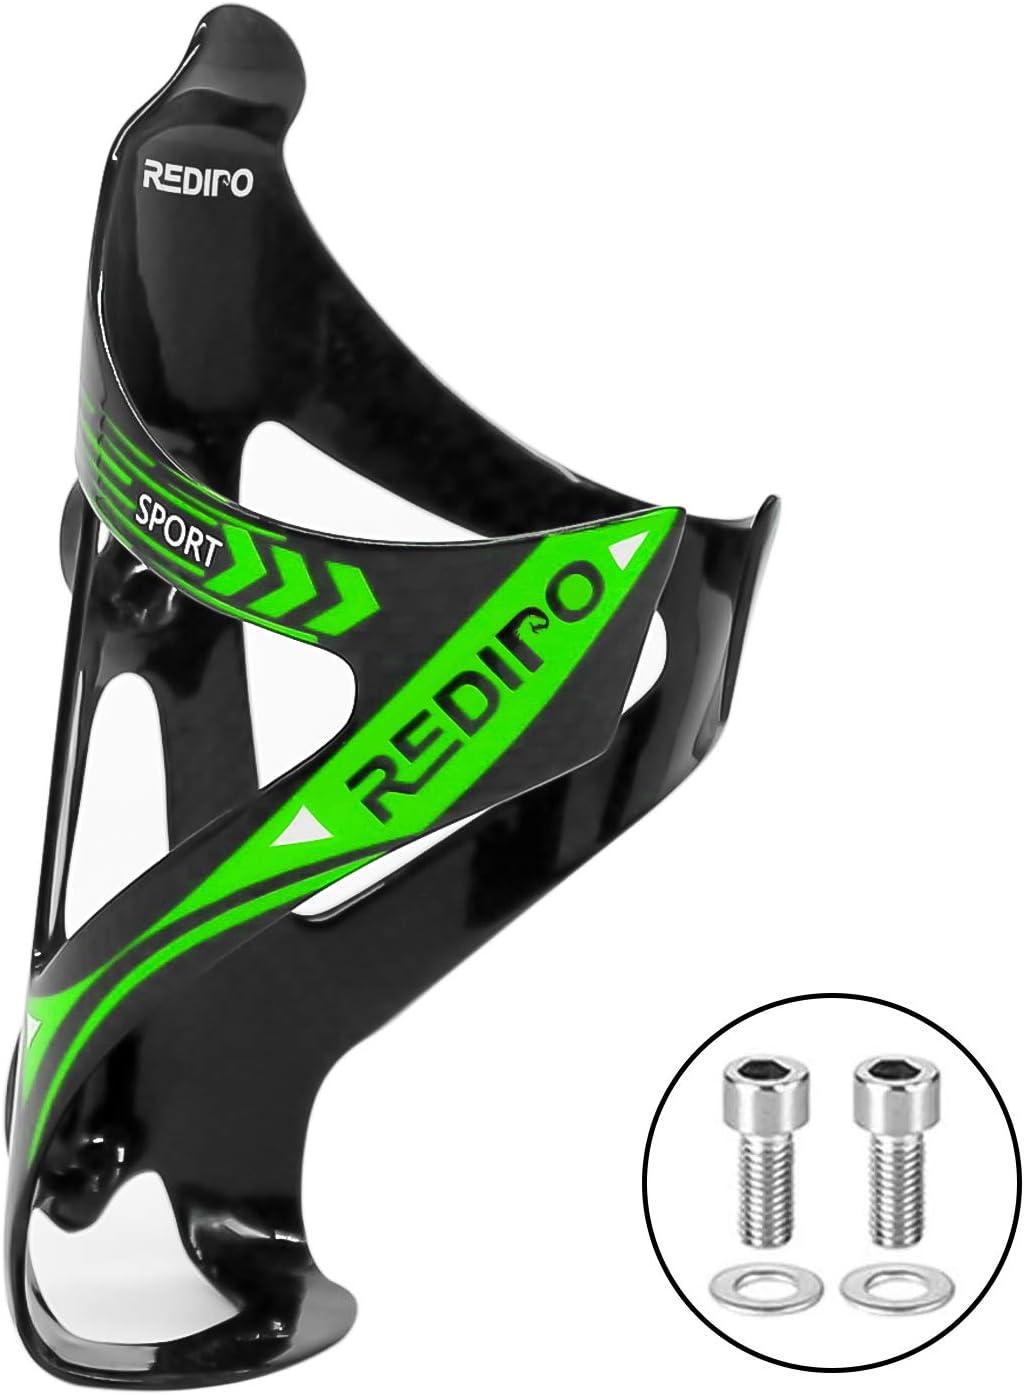 Black//Red Useful Carbon Fiber Bike Glass Water Bottle Holder Cage Cyclist Equip